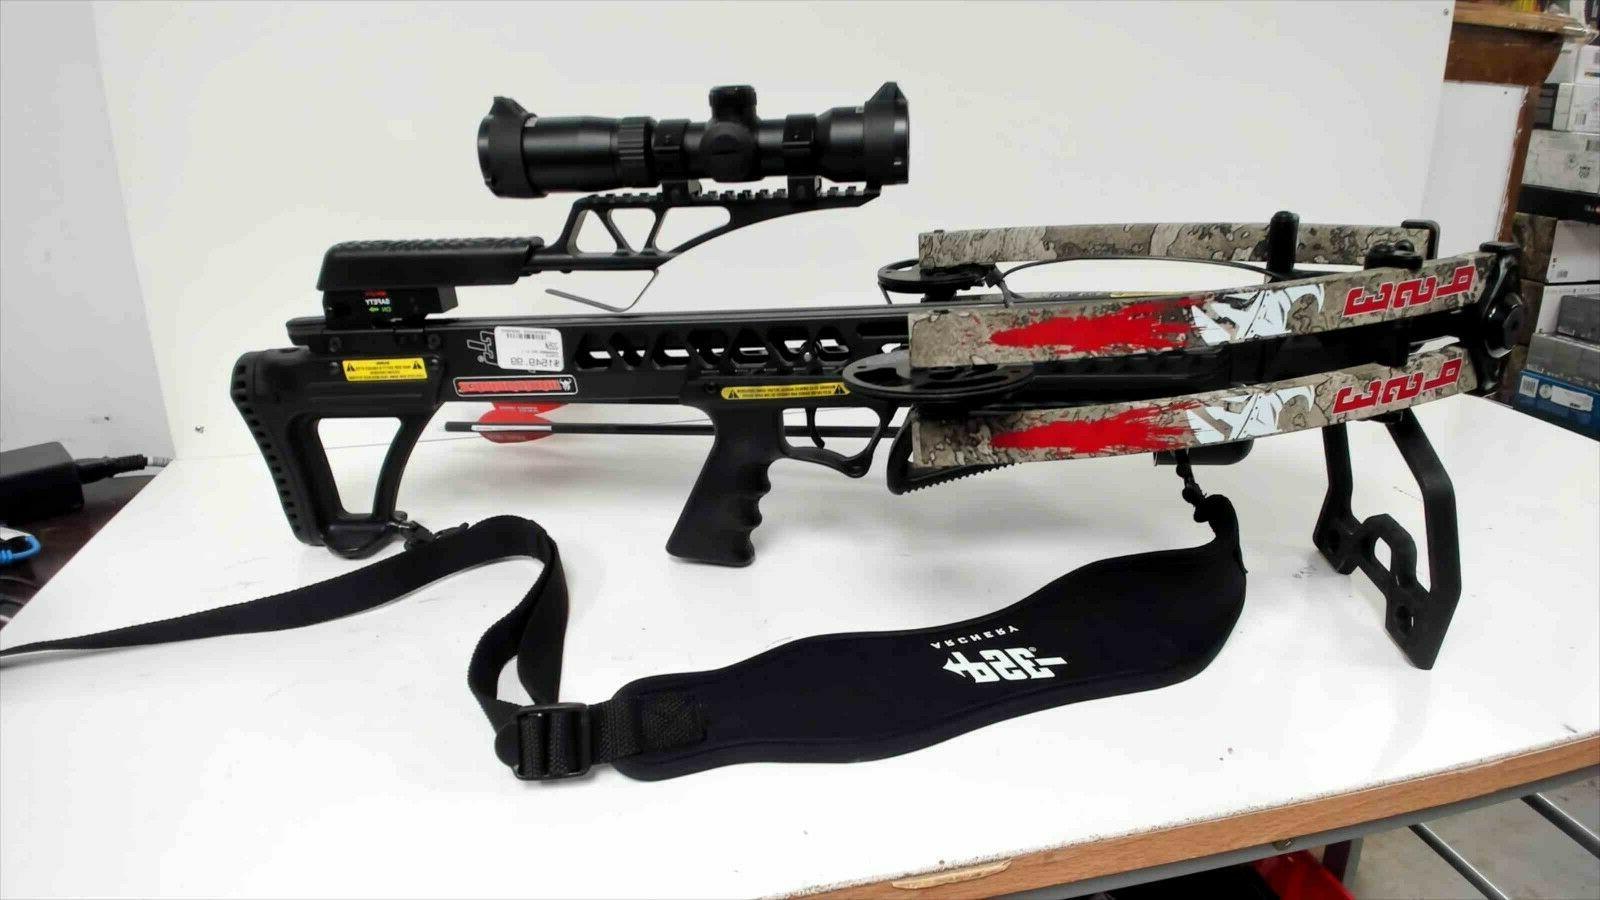 warhammer crossbow black 400fps